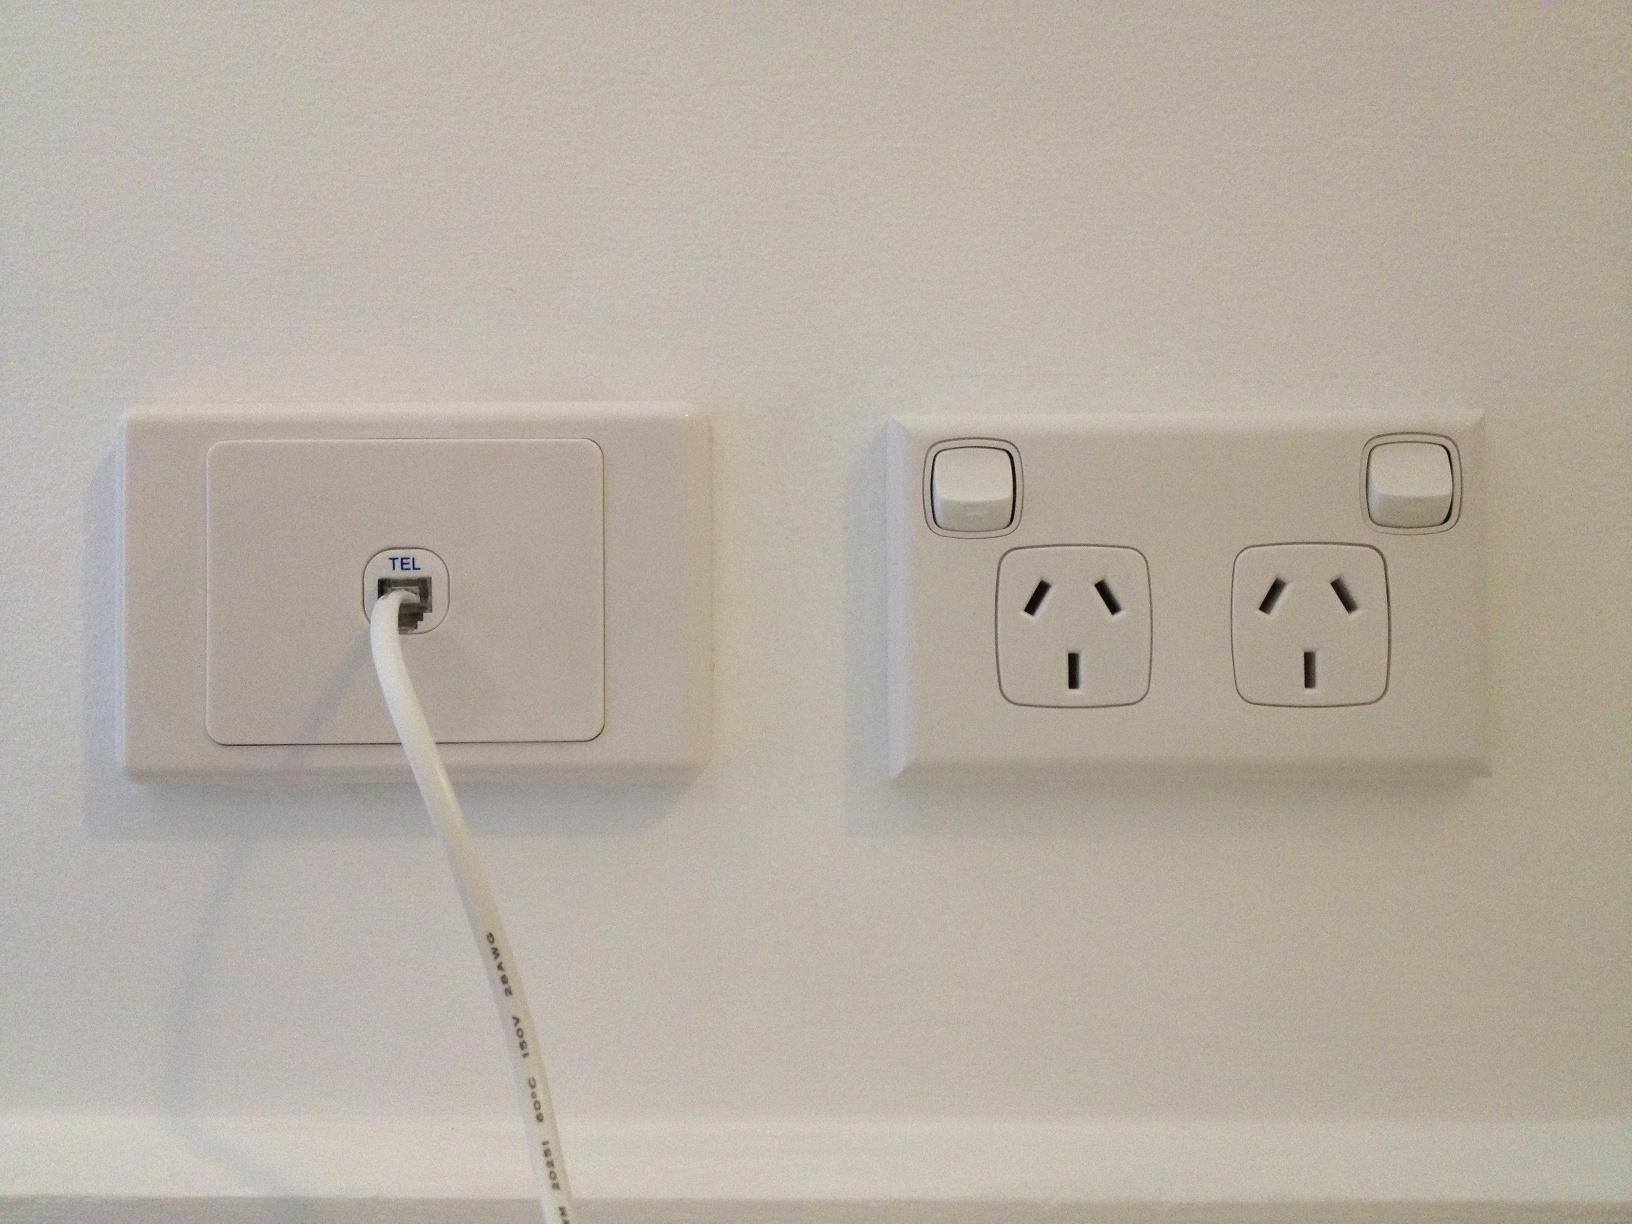 rj11 wall socket wiring diagram australia schema wiring diagram rj11 wall plate wiring diagram rj11 wall socket wiring diagram [ 1632 x 1224 Pixel ]